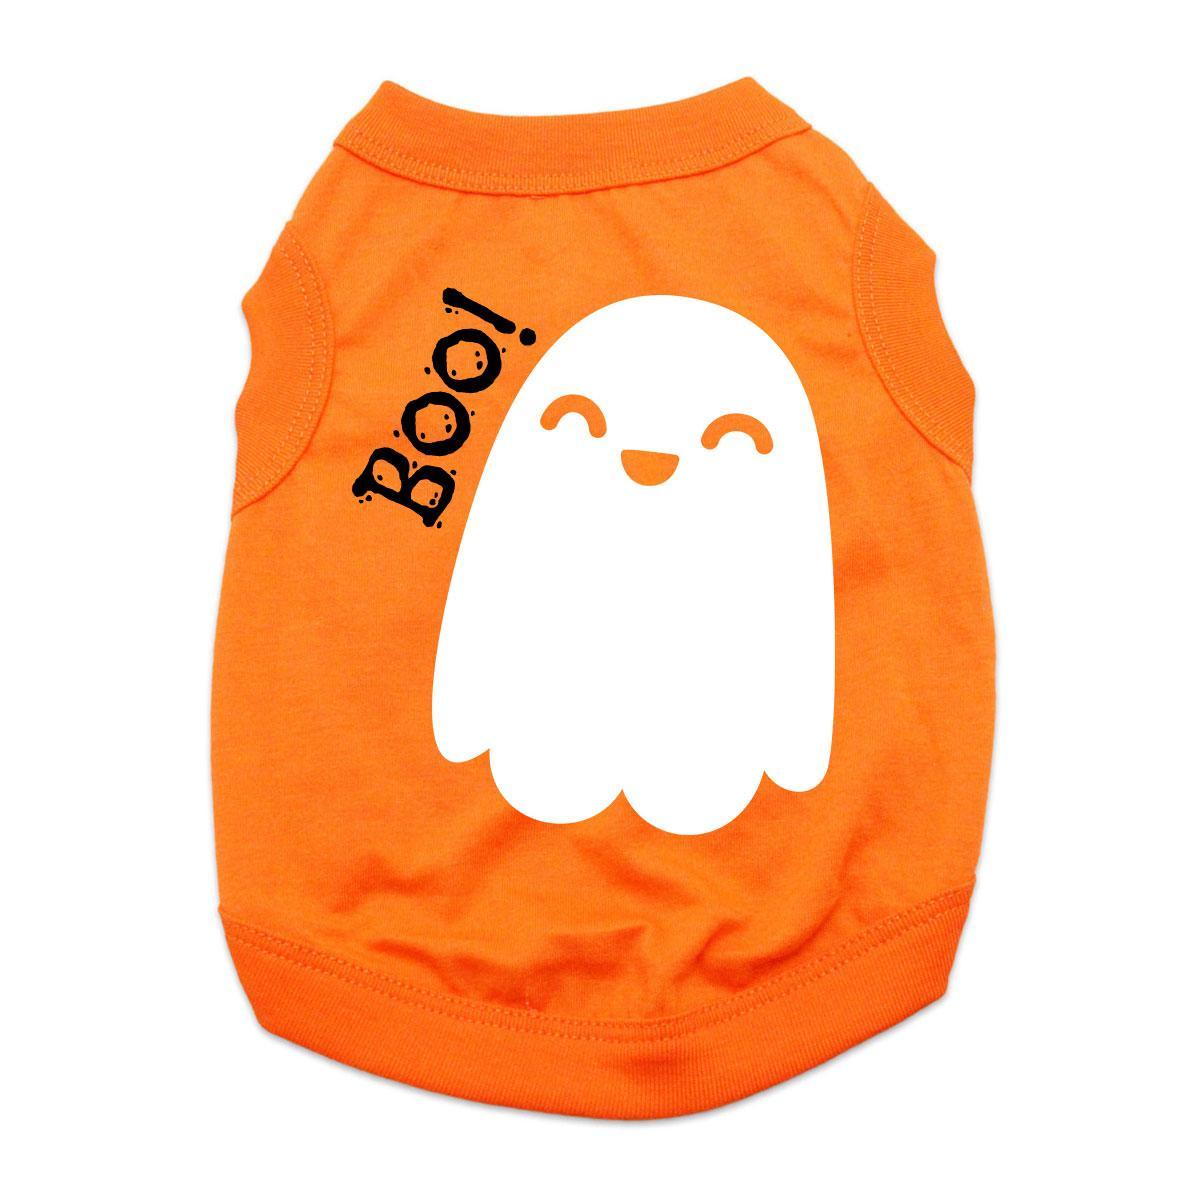 Friendly Boo Ghost Dog Shirt - Orange